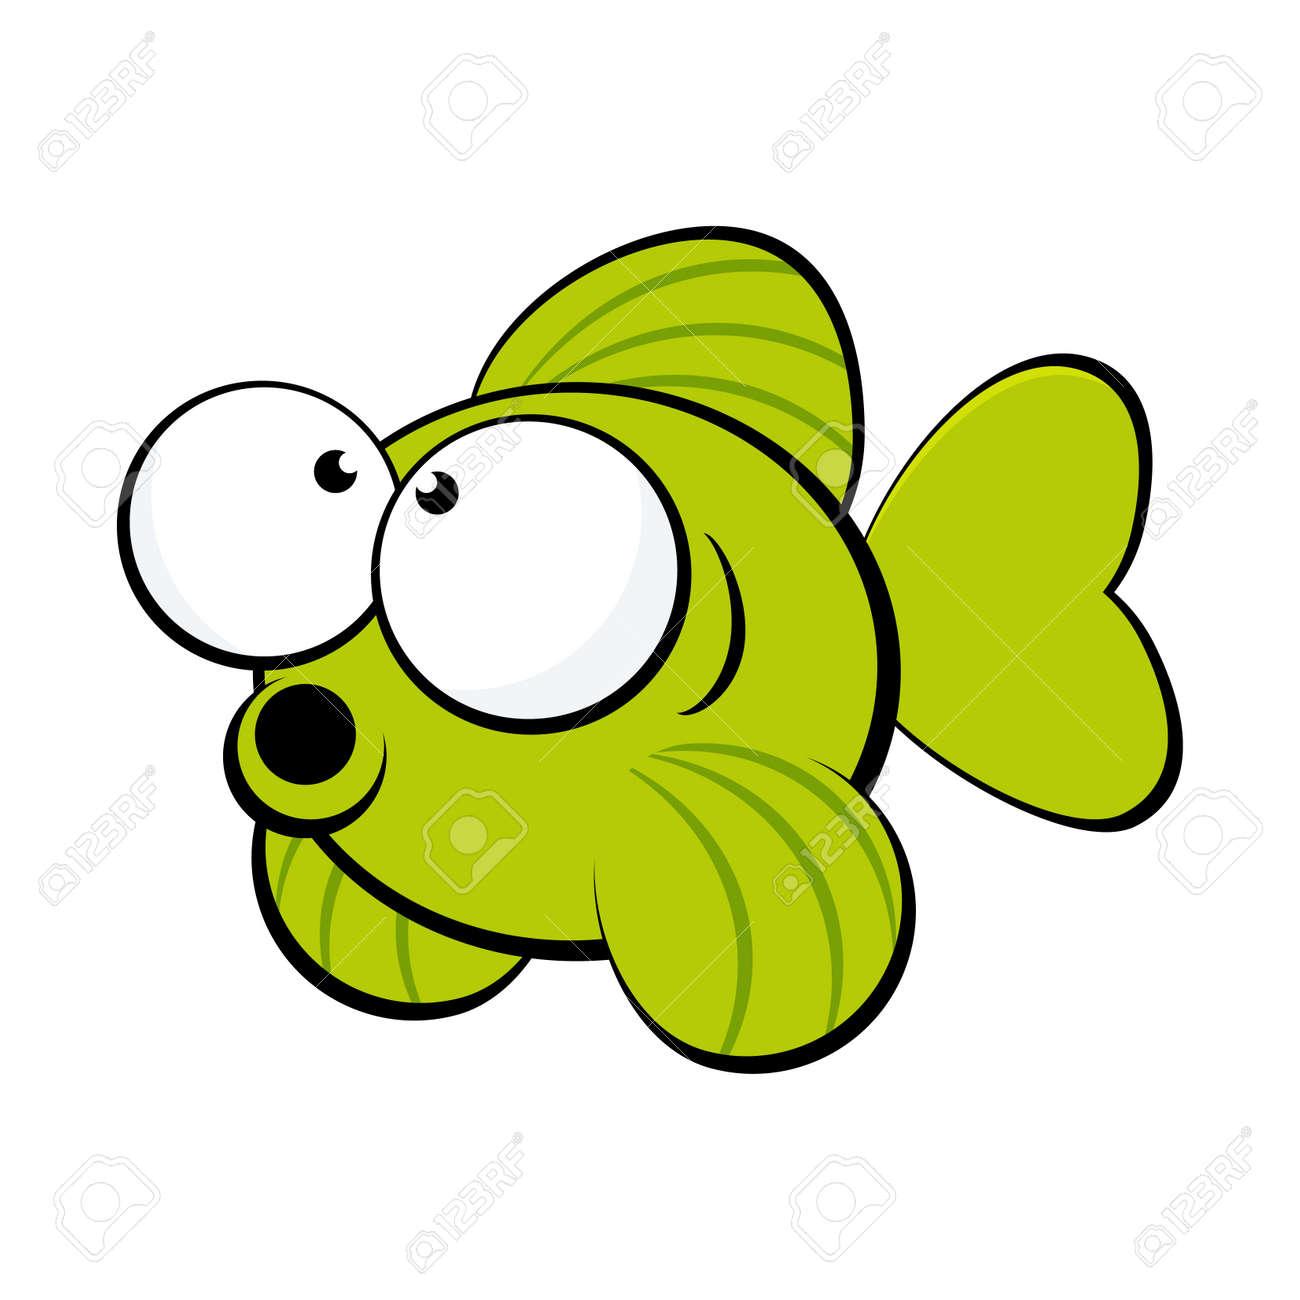 Funny Cartoon Fish Royalty Free Cliparts, Vectors, And Stock ...